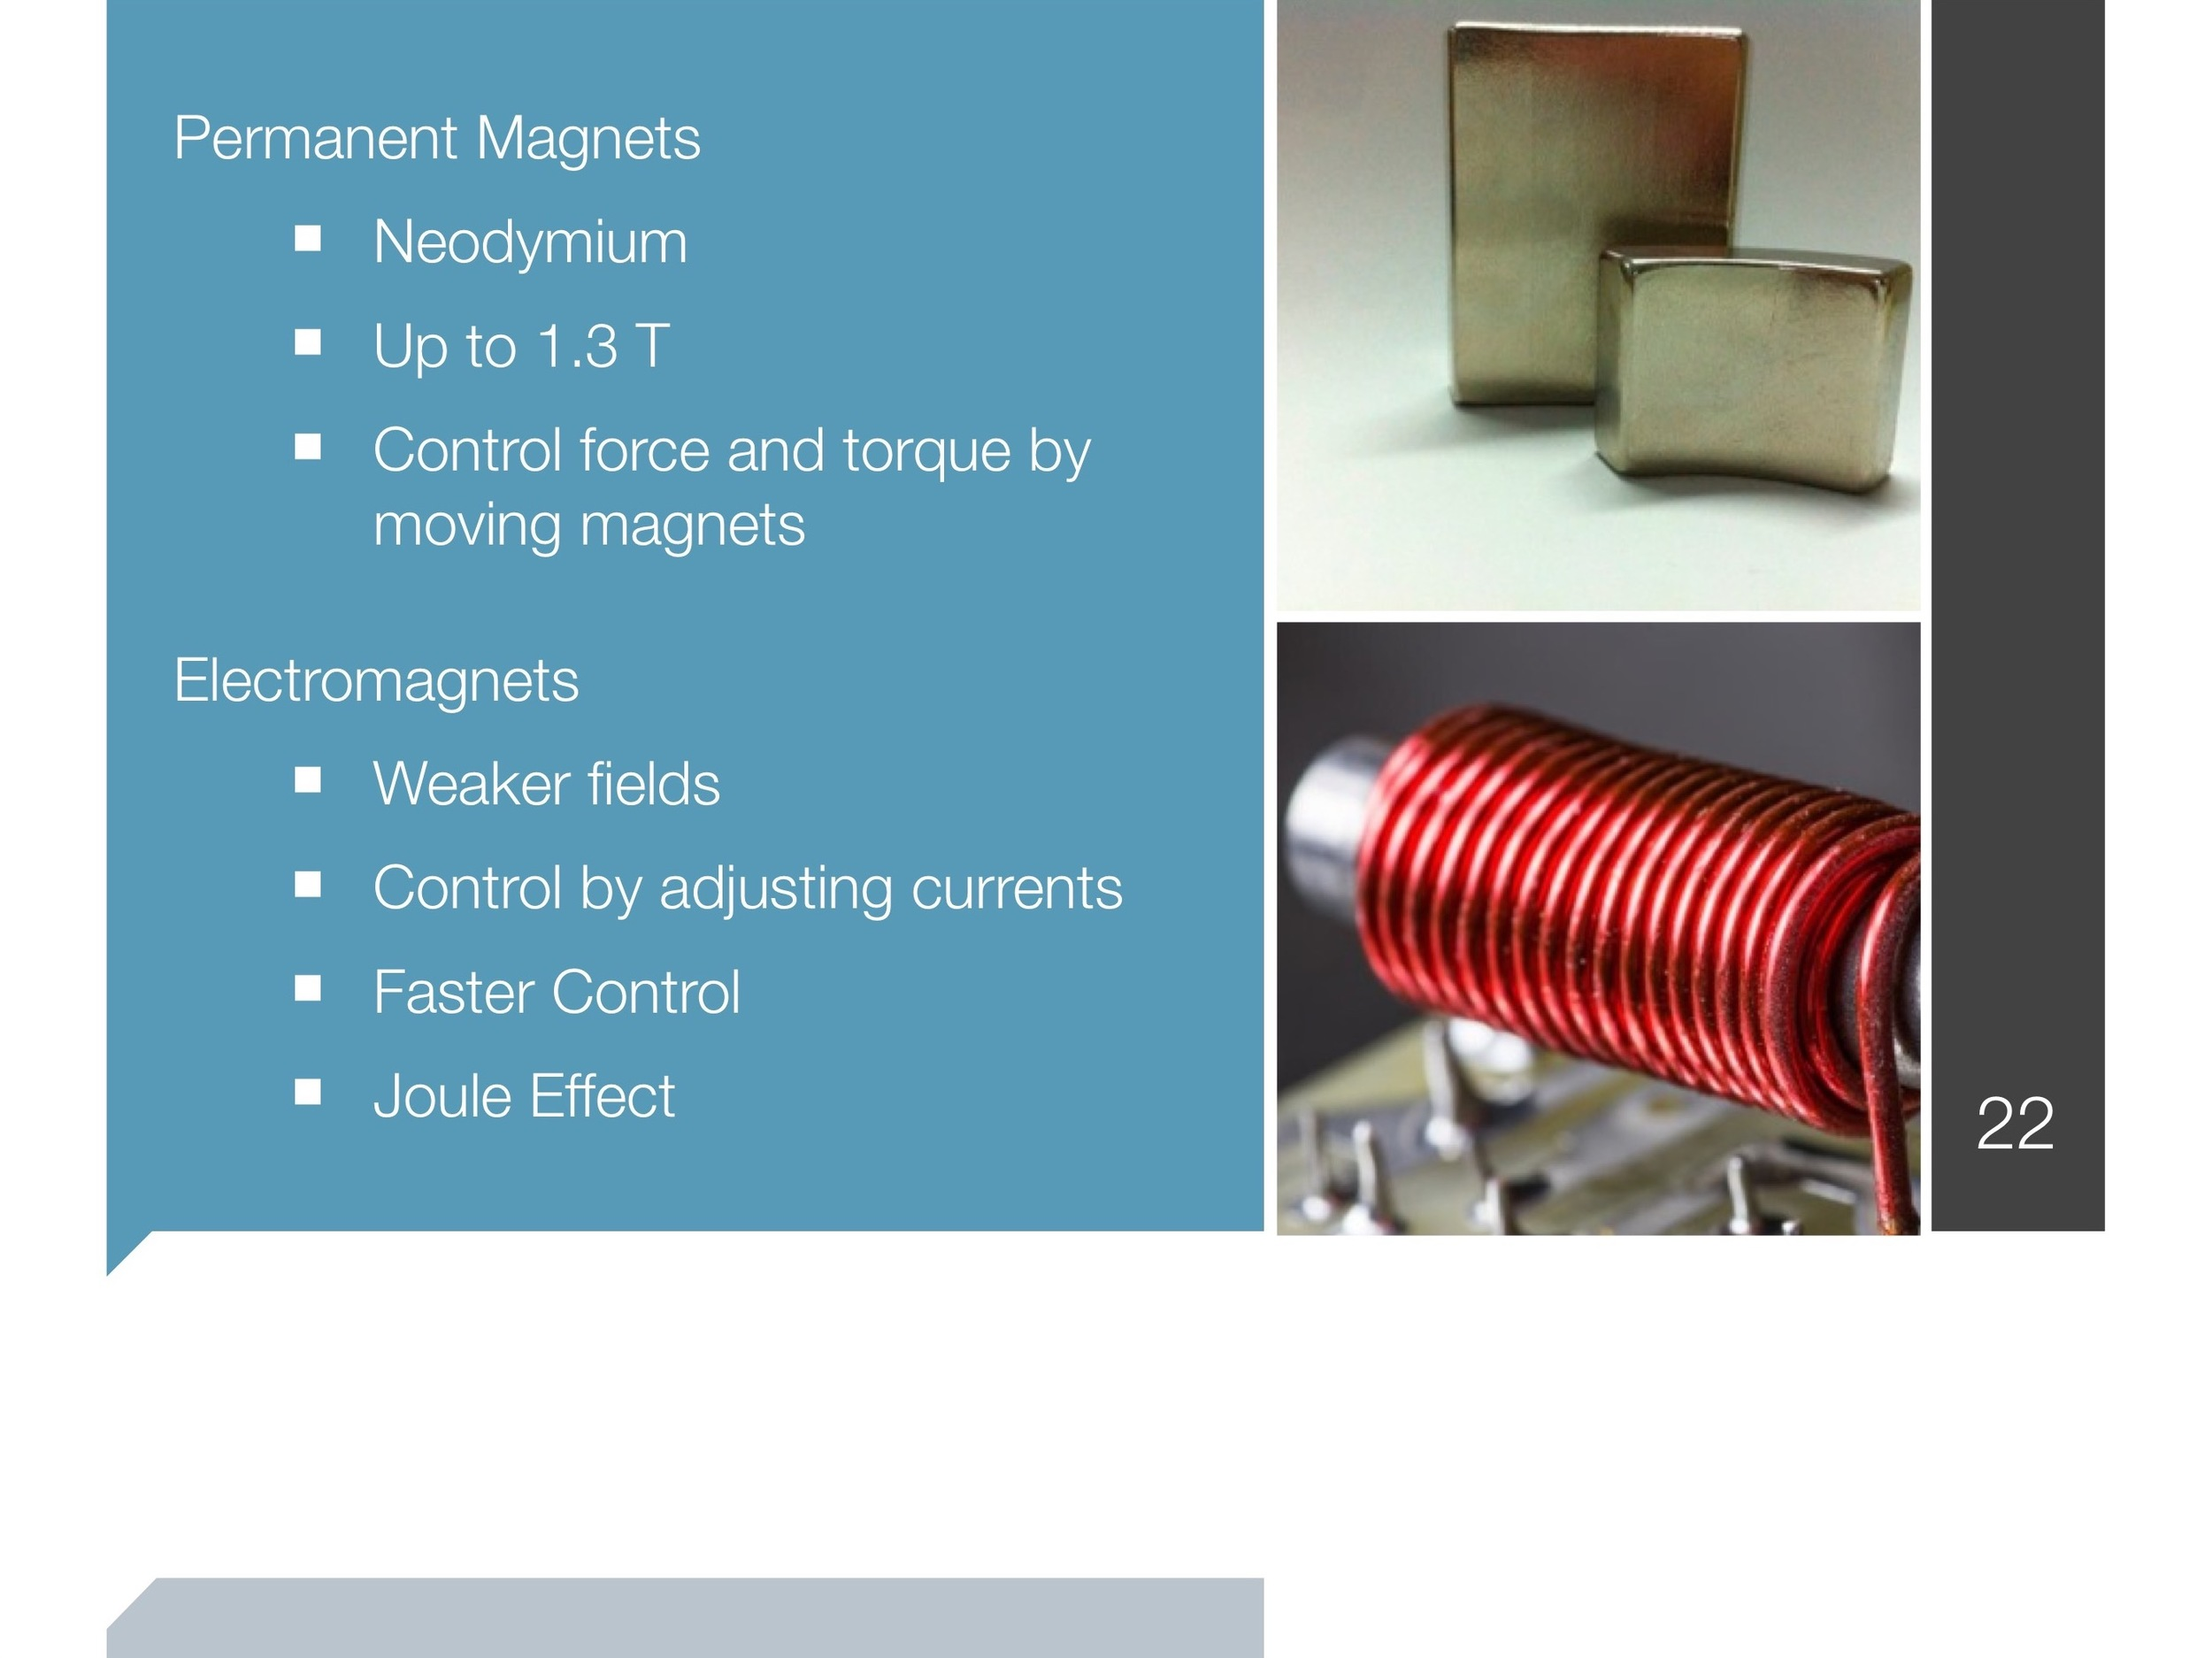 magnetic-tweezers_presentation 29 copy.jpeg